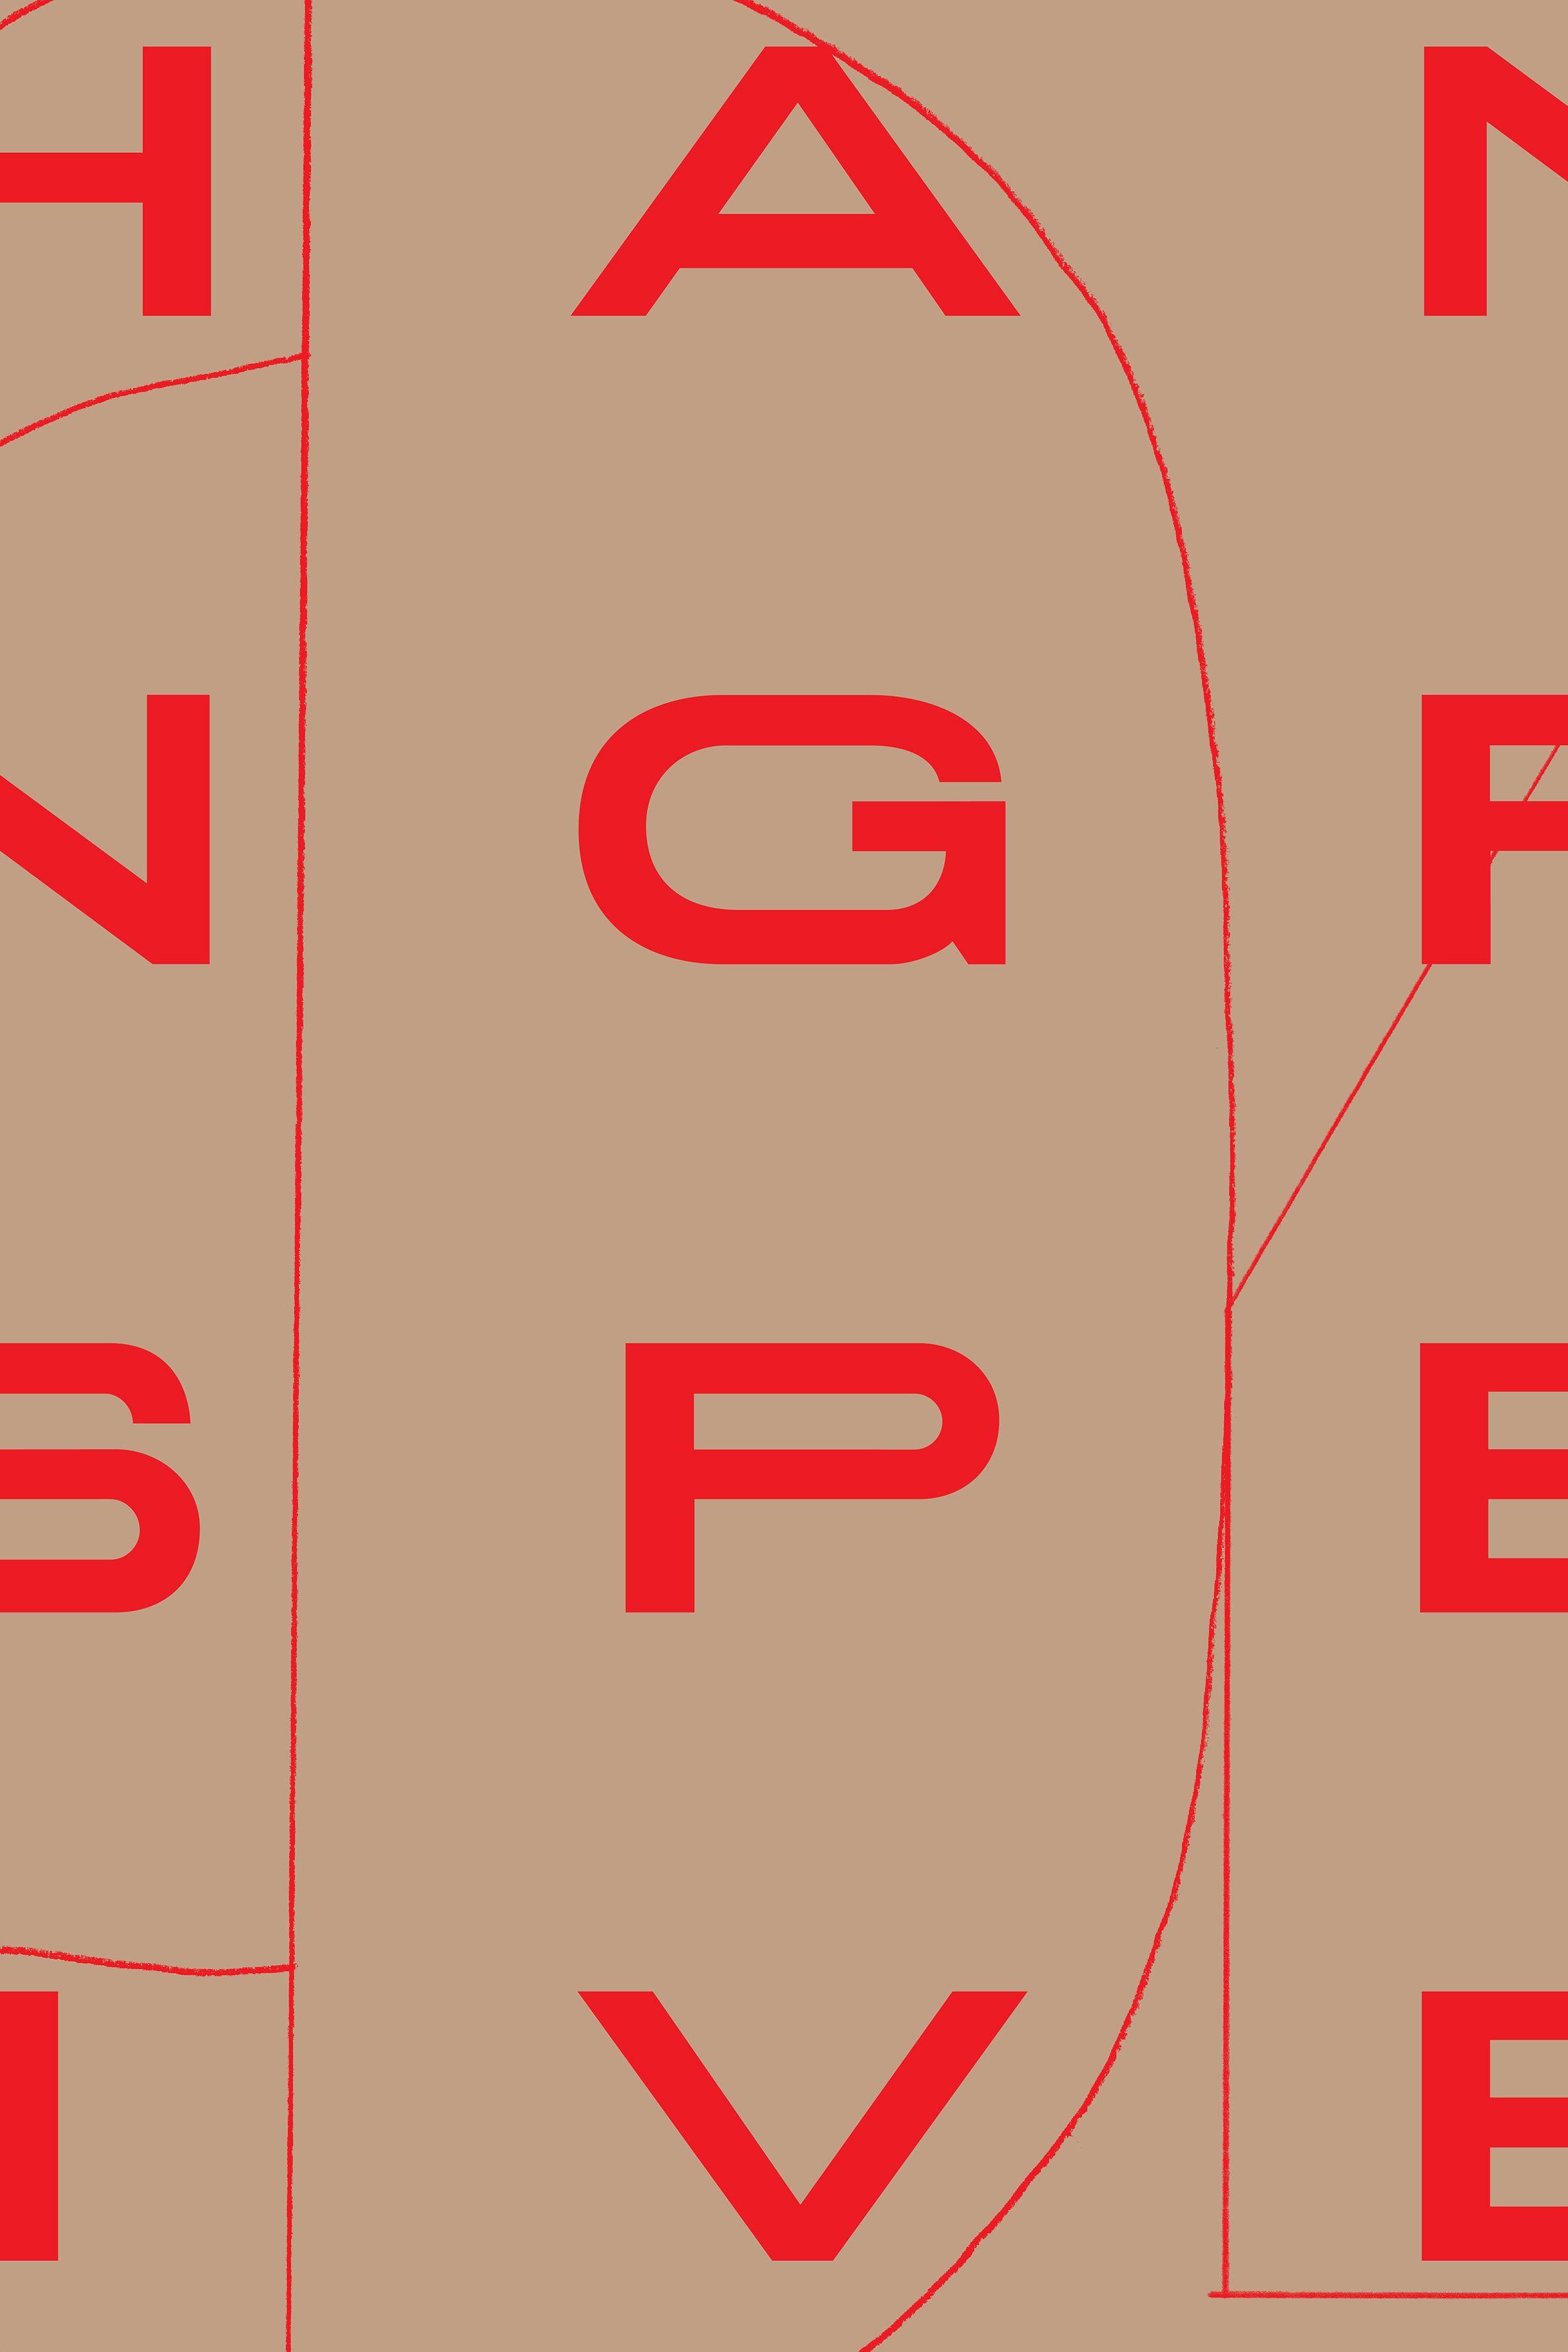 Rika Magazine issue no. 18 custom typeface design